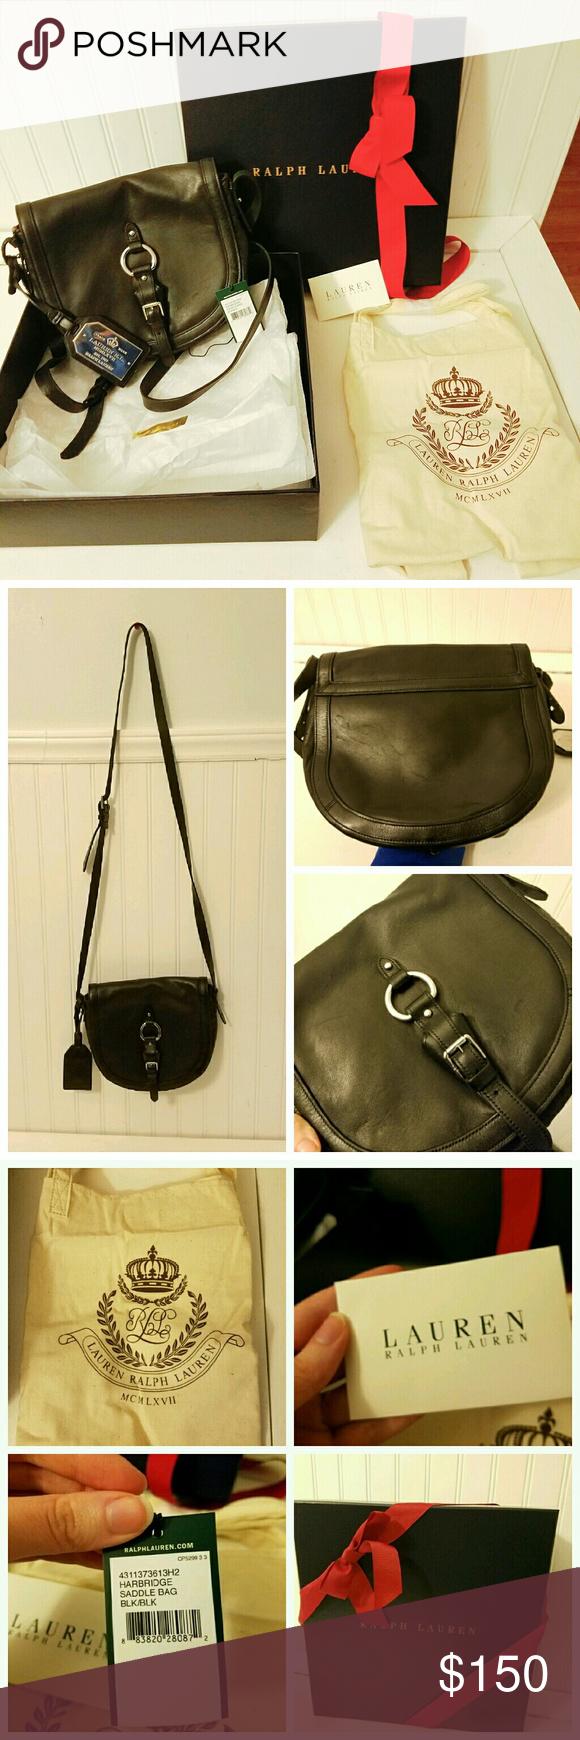 Selling this Lauren Ralph Lauren Harbridge Saddle Bag Black on Poshmark! My  username is  hffmeissner.  shopmycloset  poshmark  fashion  shopping  style  ... f2e25316c8